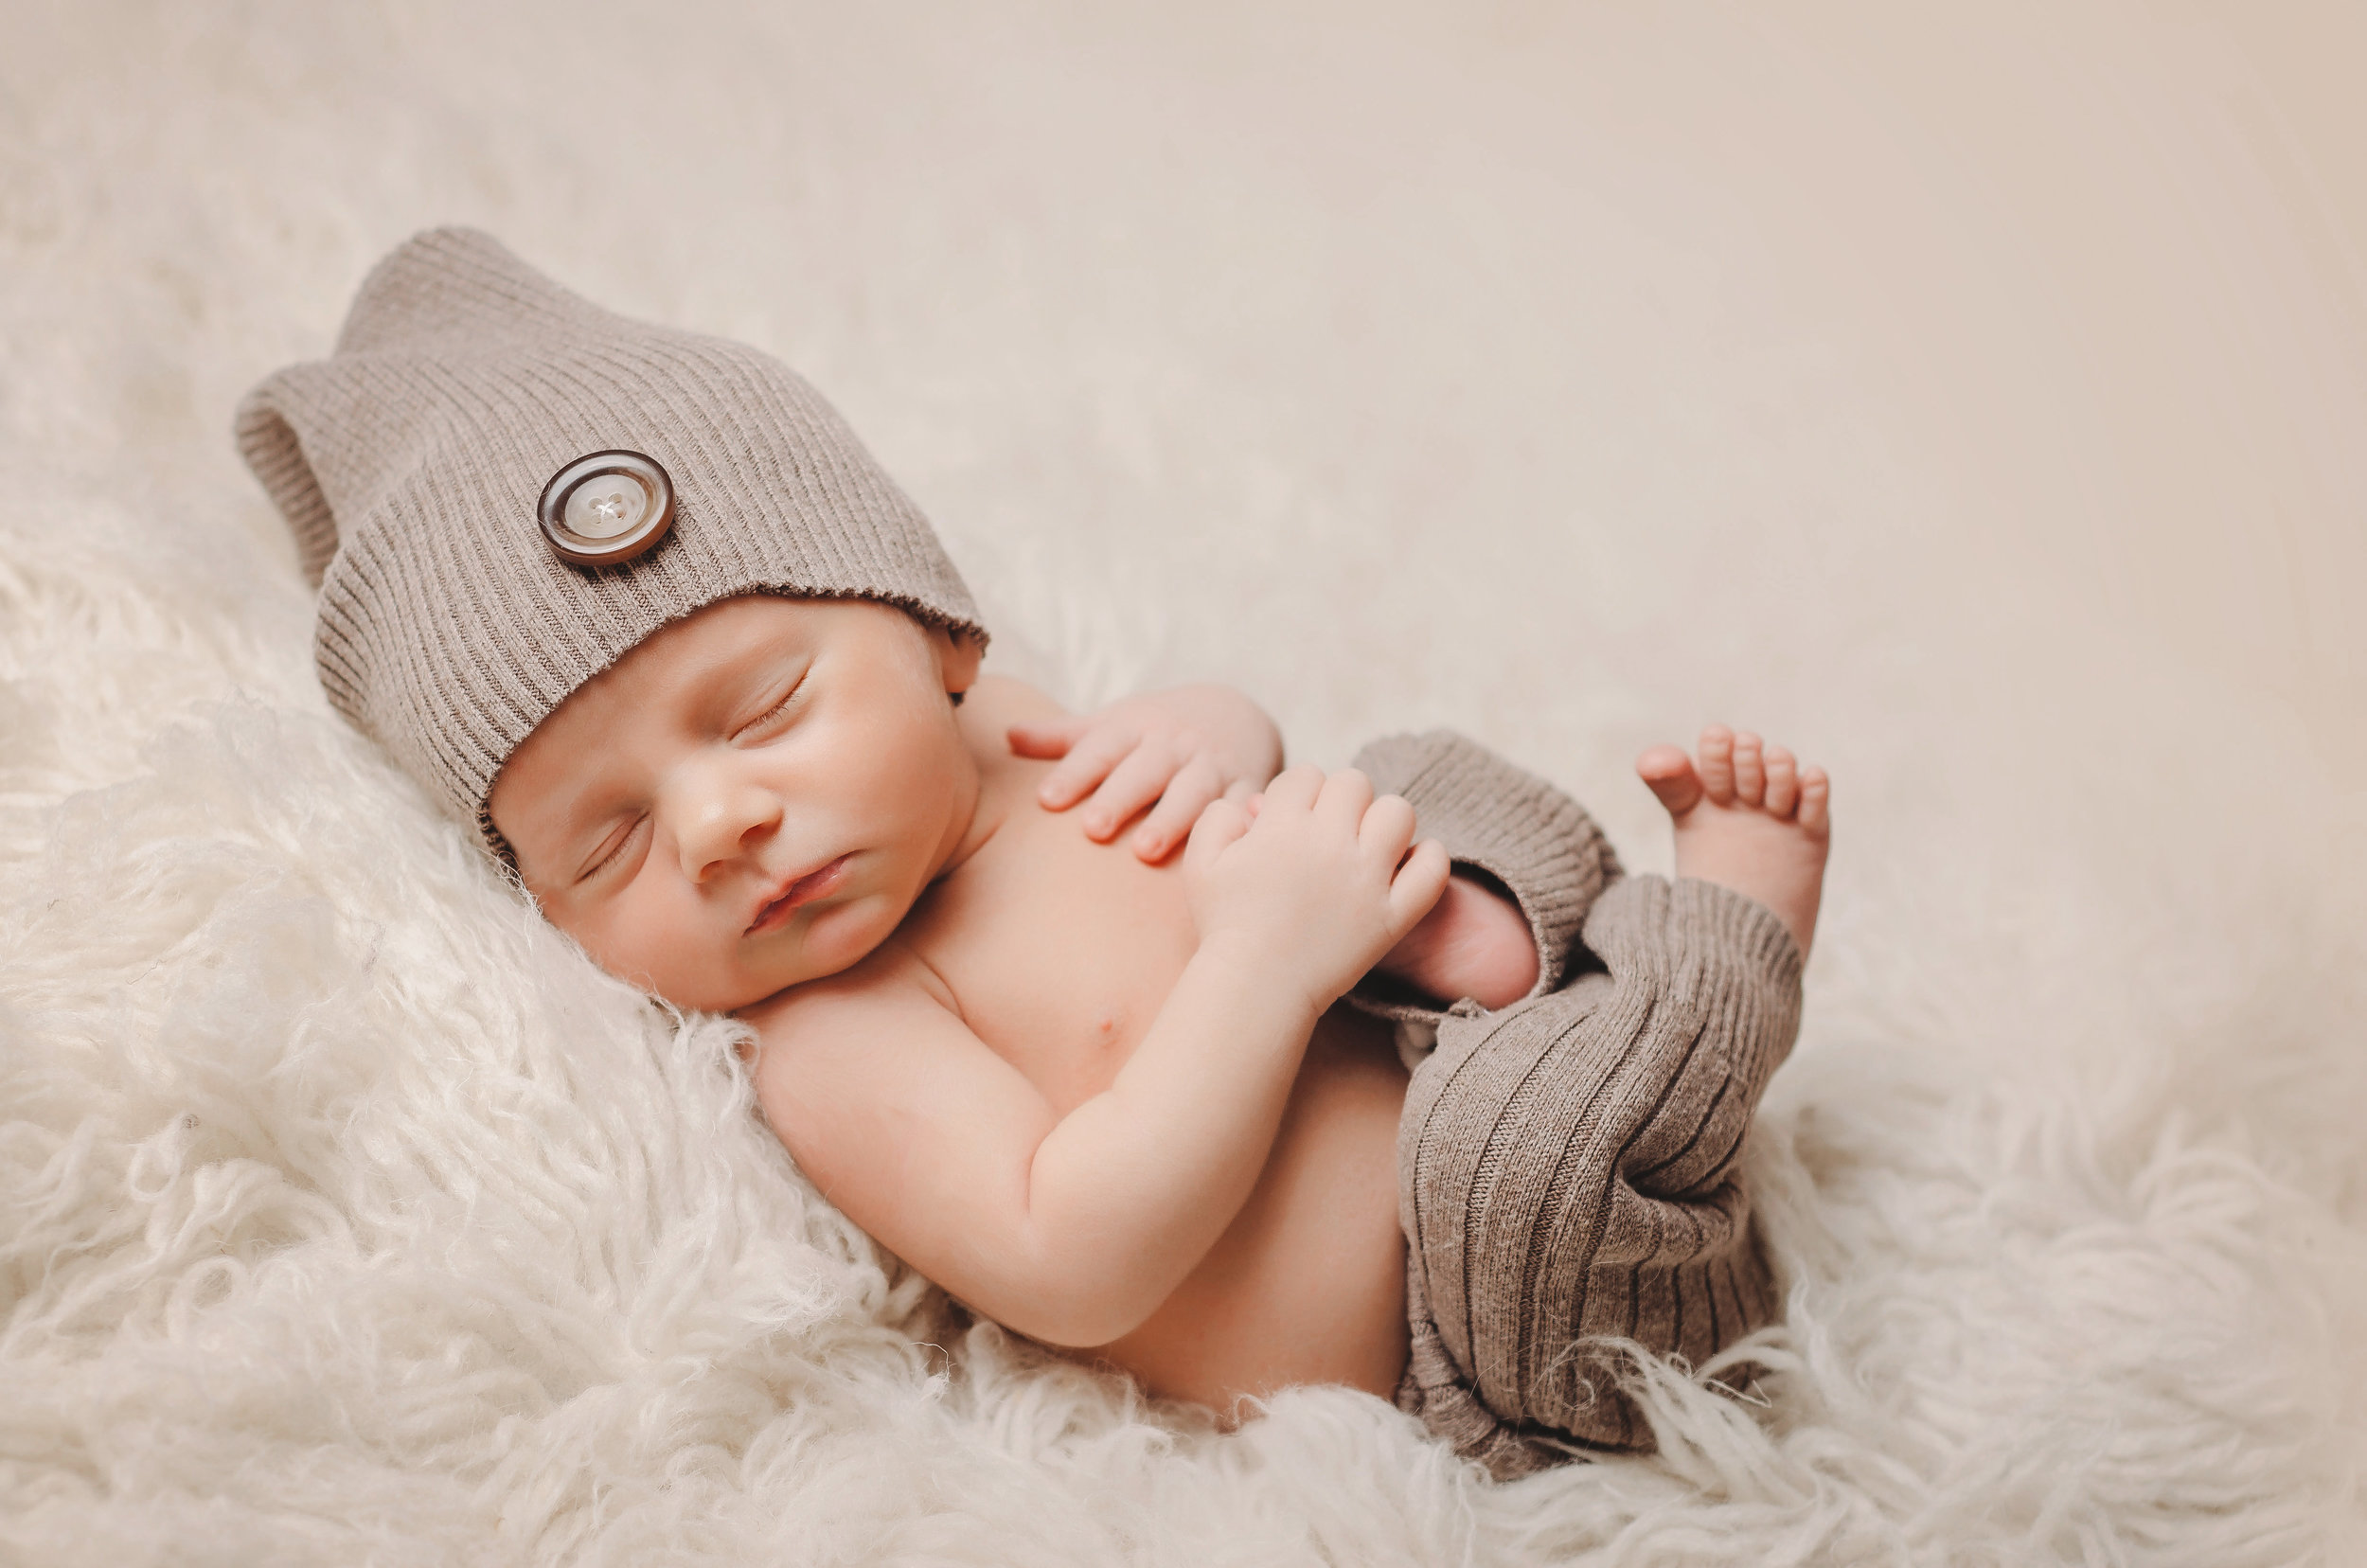 KSP_Newborn_Foley_07_16_022.jpg